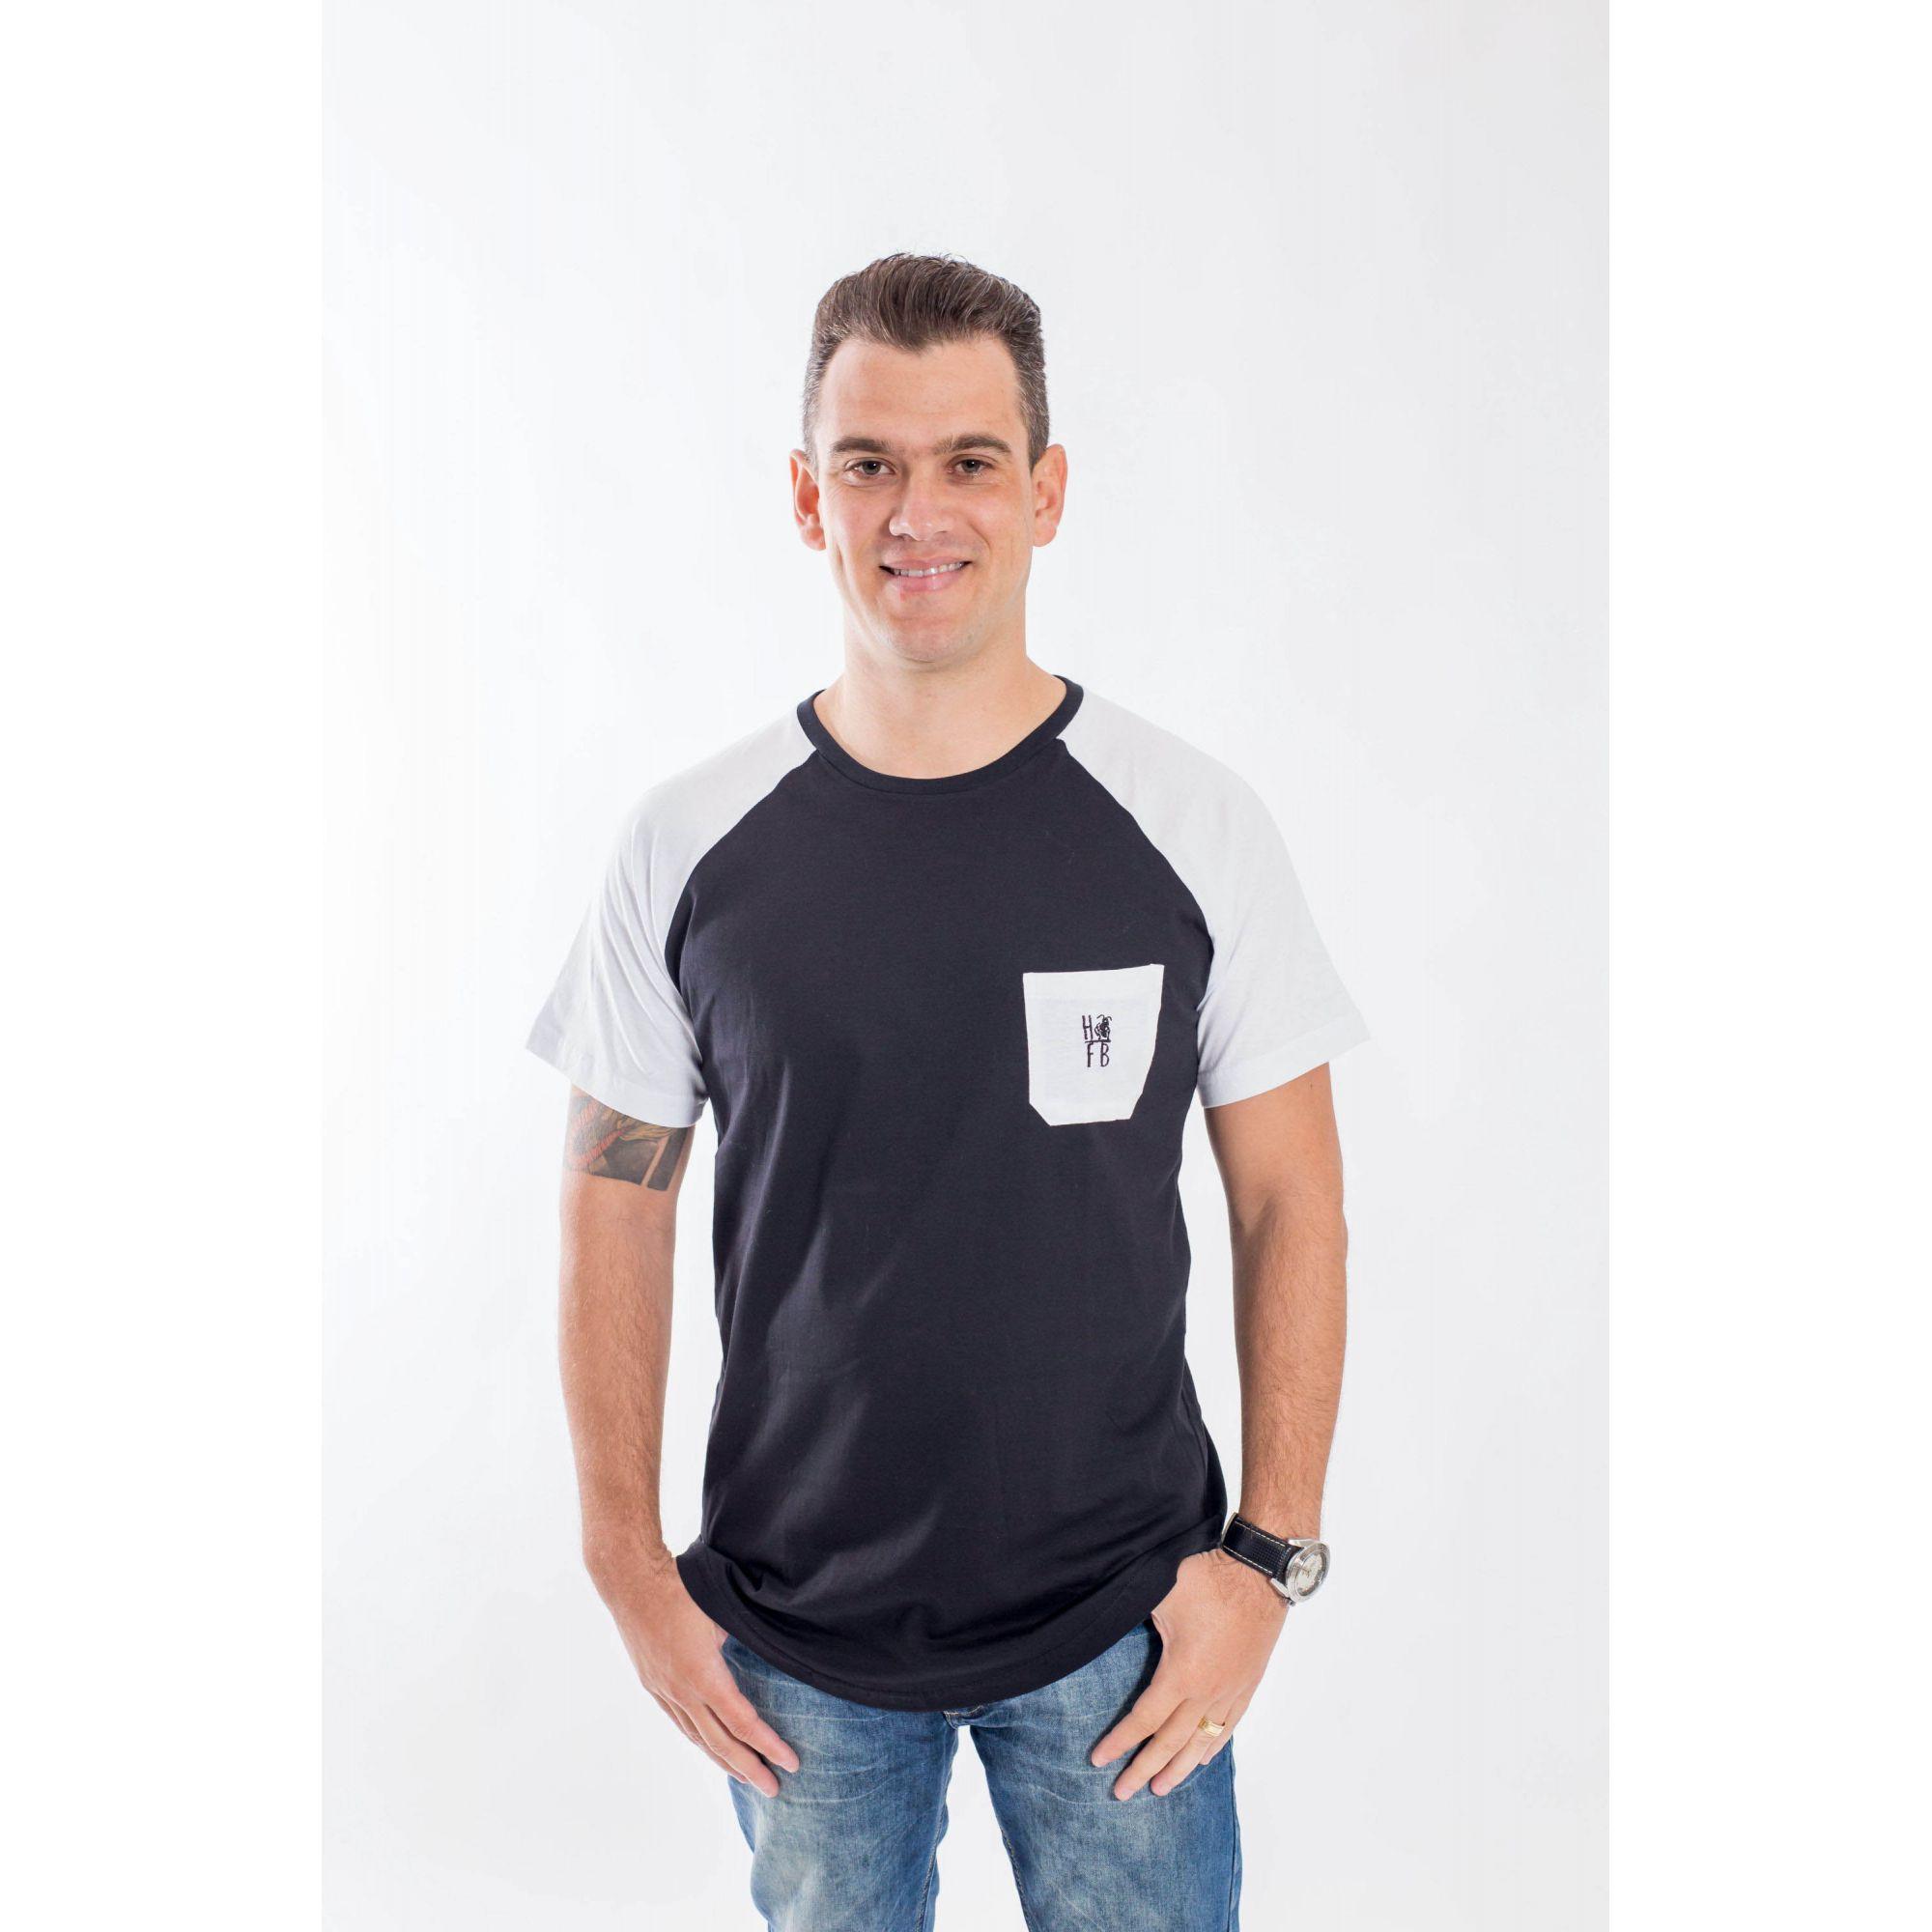 Camiseta Raglan Long Preta Bolso Branco Masculina  - Heitor Fashion Brazil